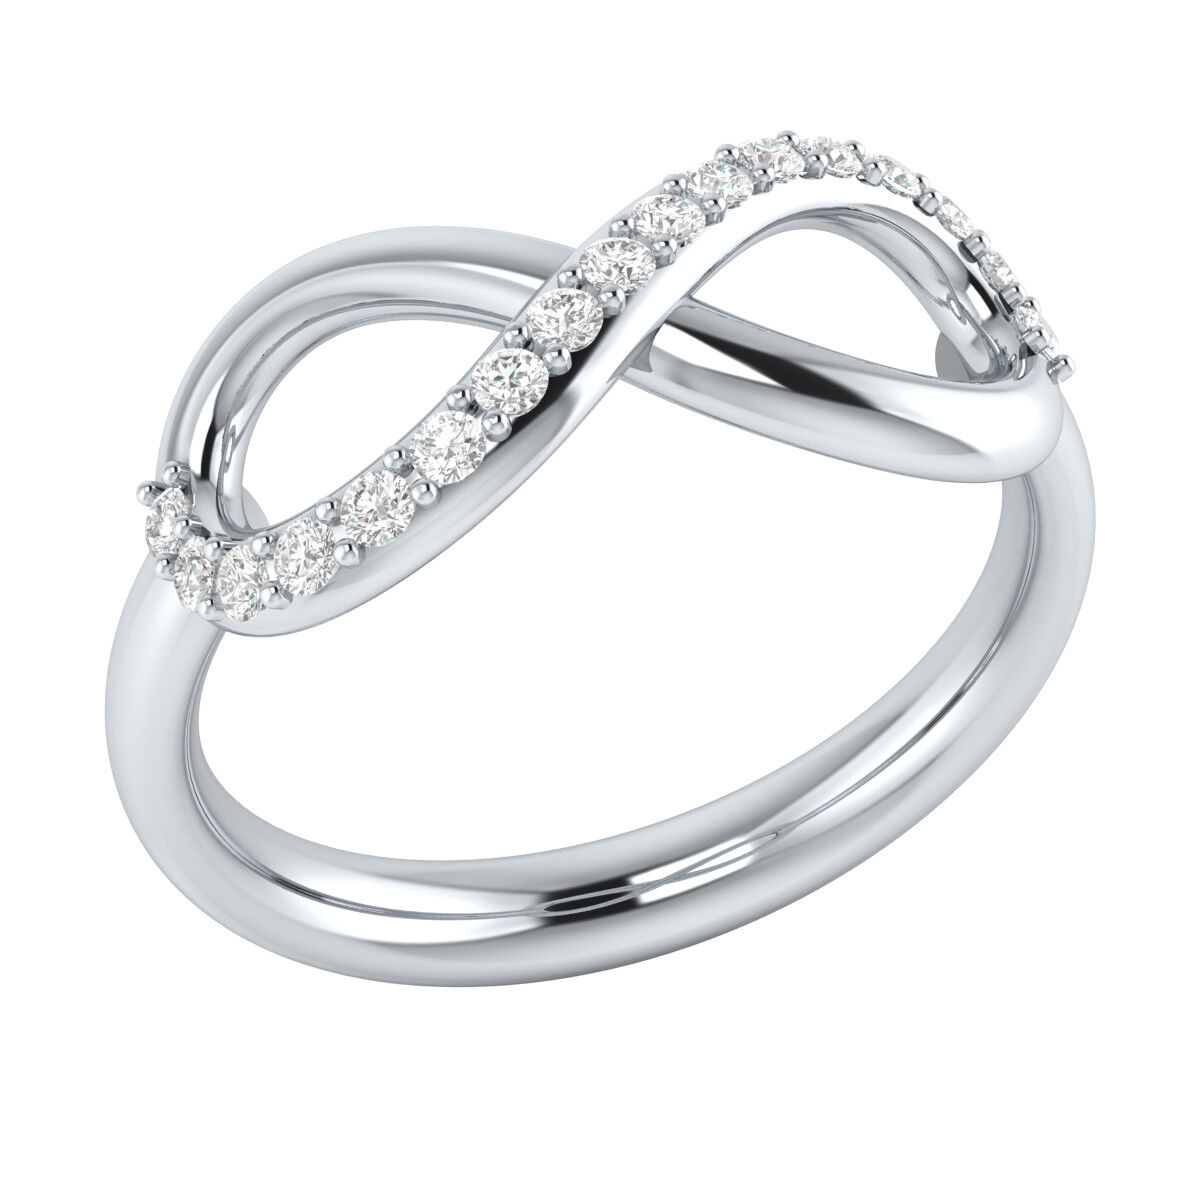 0.20 Ct Round Cut Diamond Infinity Promise Ring 14k White gold GP Valentine Day